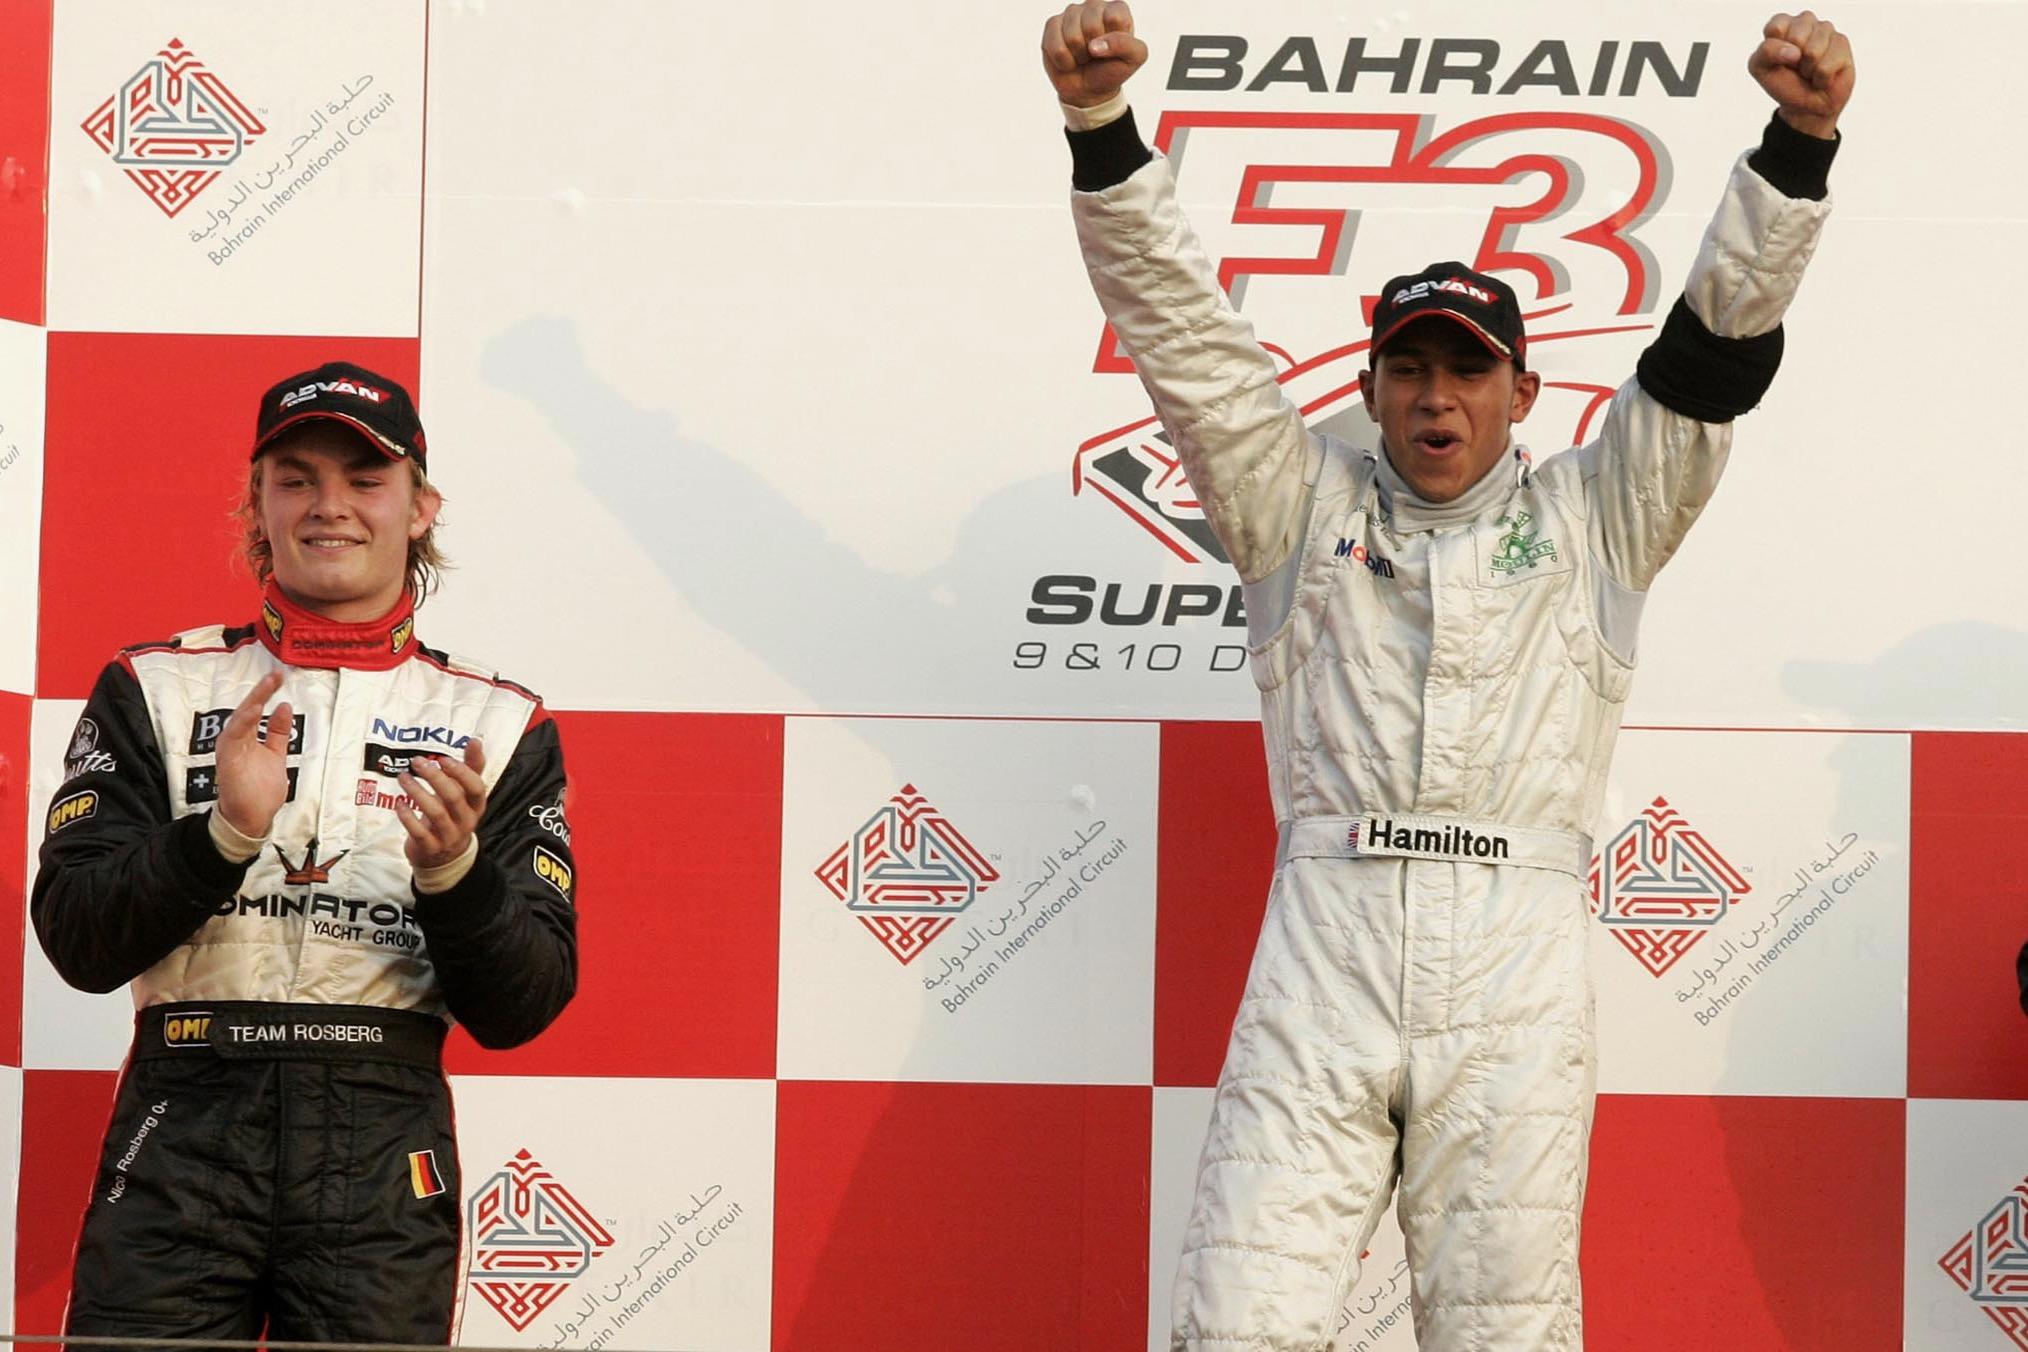 Bahrain Formula 3 Superprix